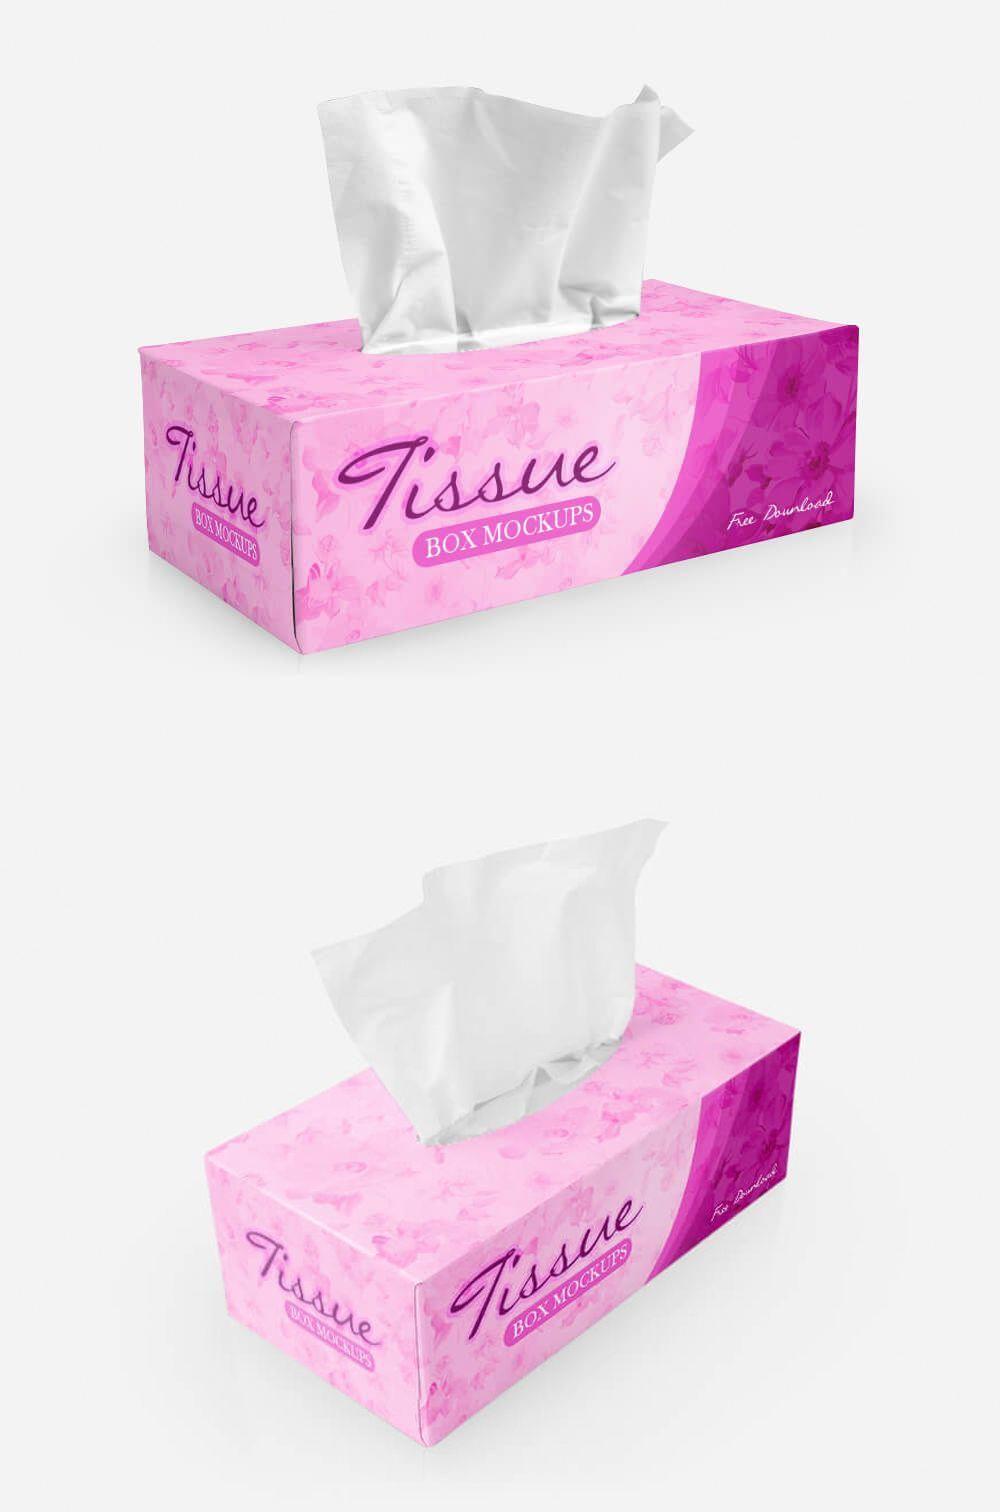 Download Guiltless Photoshop Tutorial Hair Photoshopcc Finephotoshopactionsmoody Box Mockup Tissue Boxes Photoshop Tutorial Typography